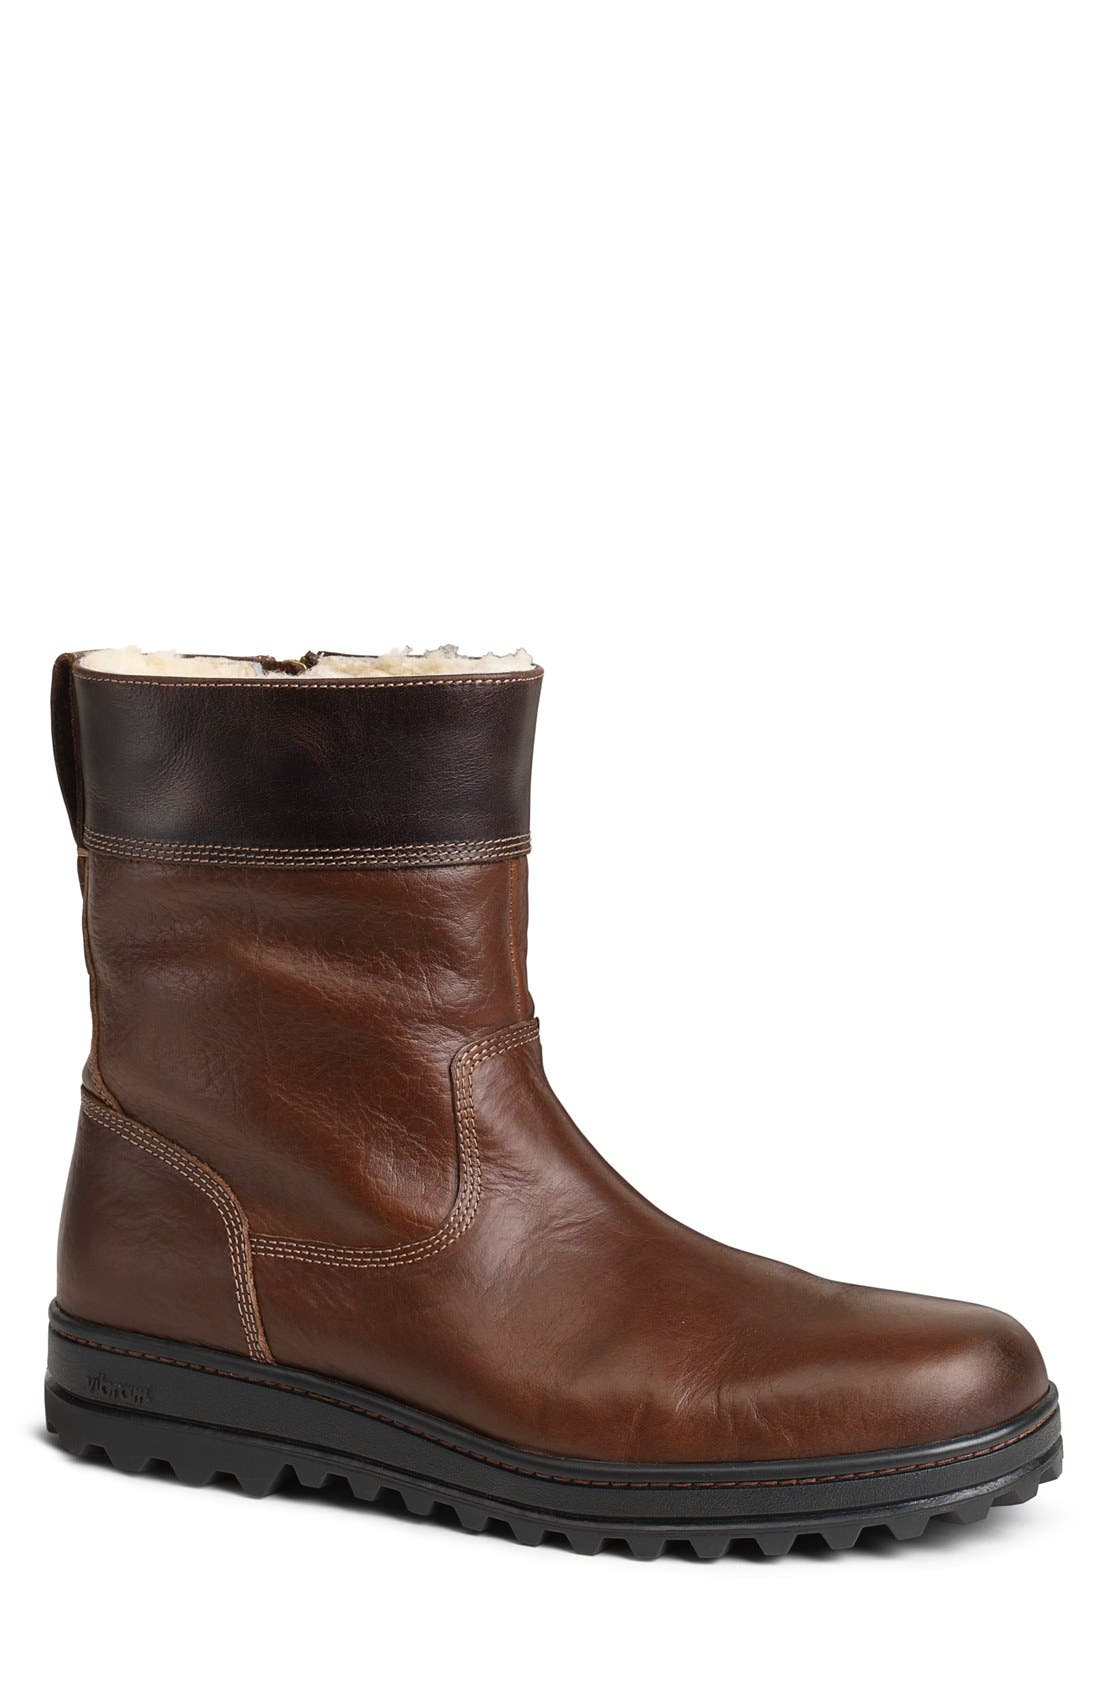 'Winslow' Plain Toe Boot,                             Main thumbnail 1, color,